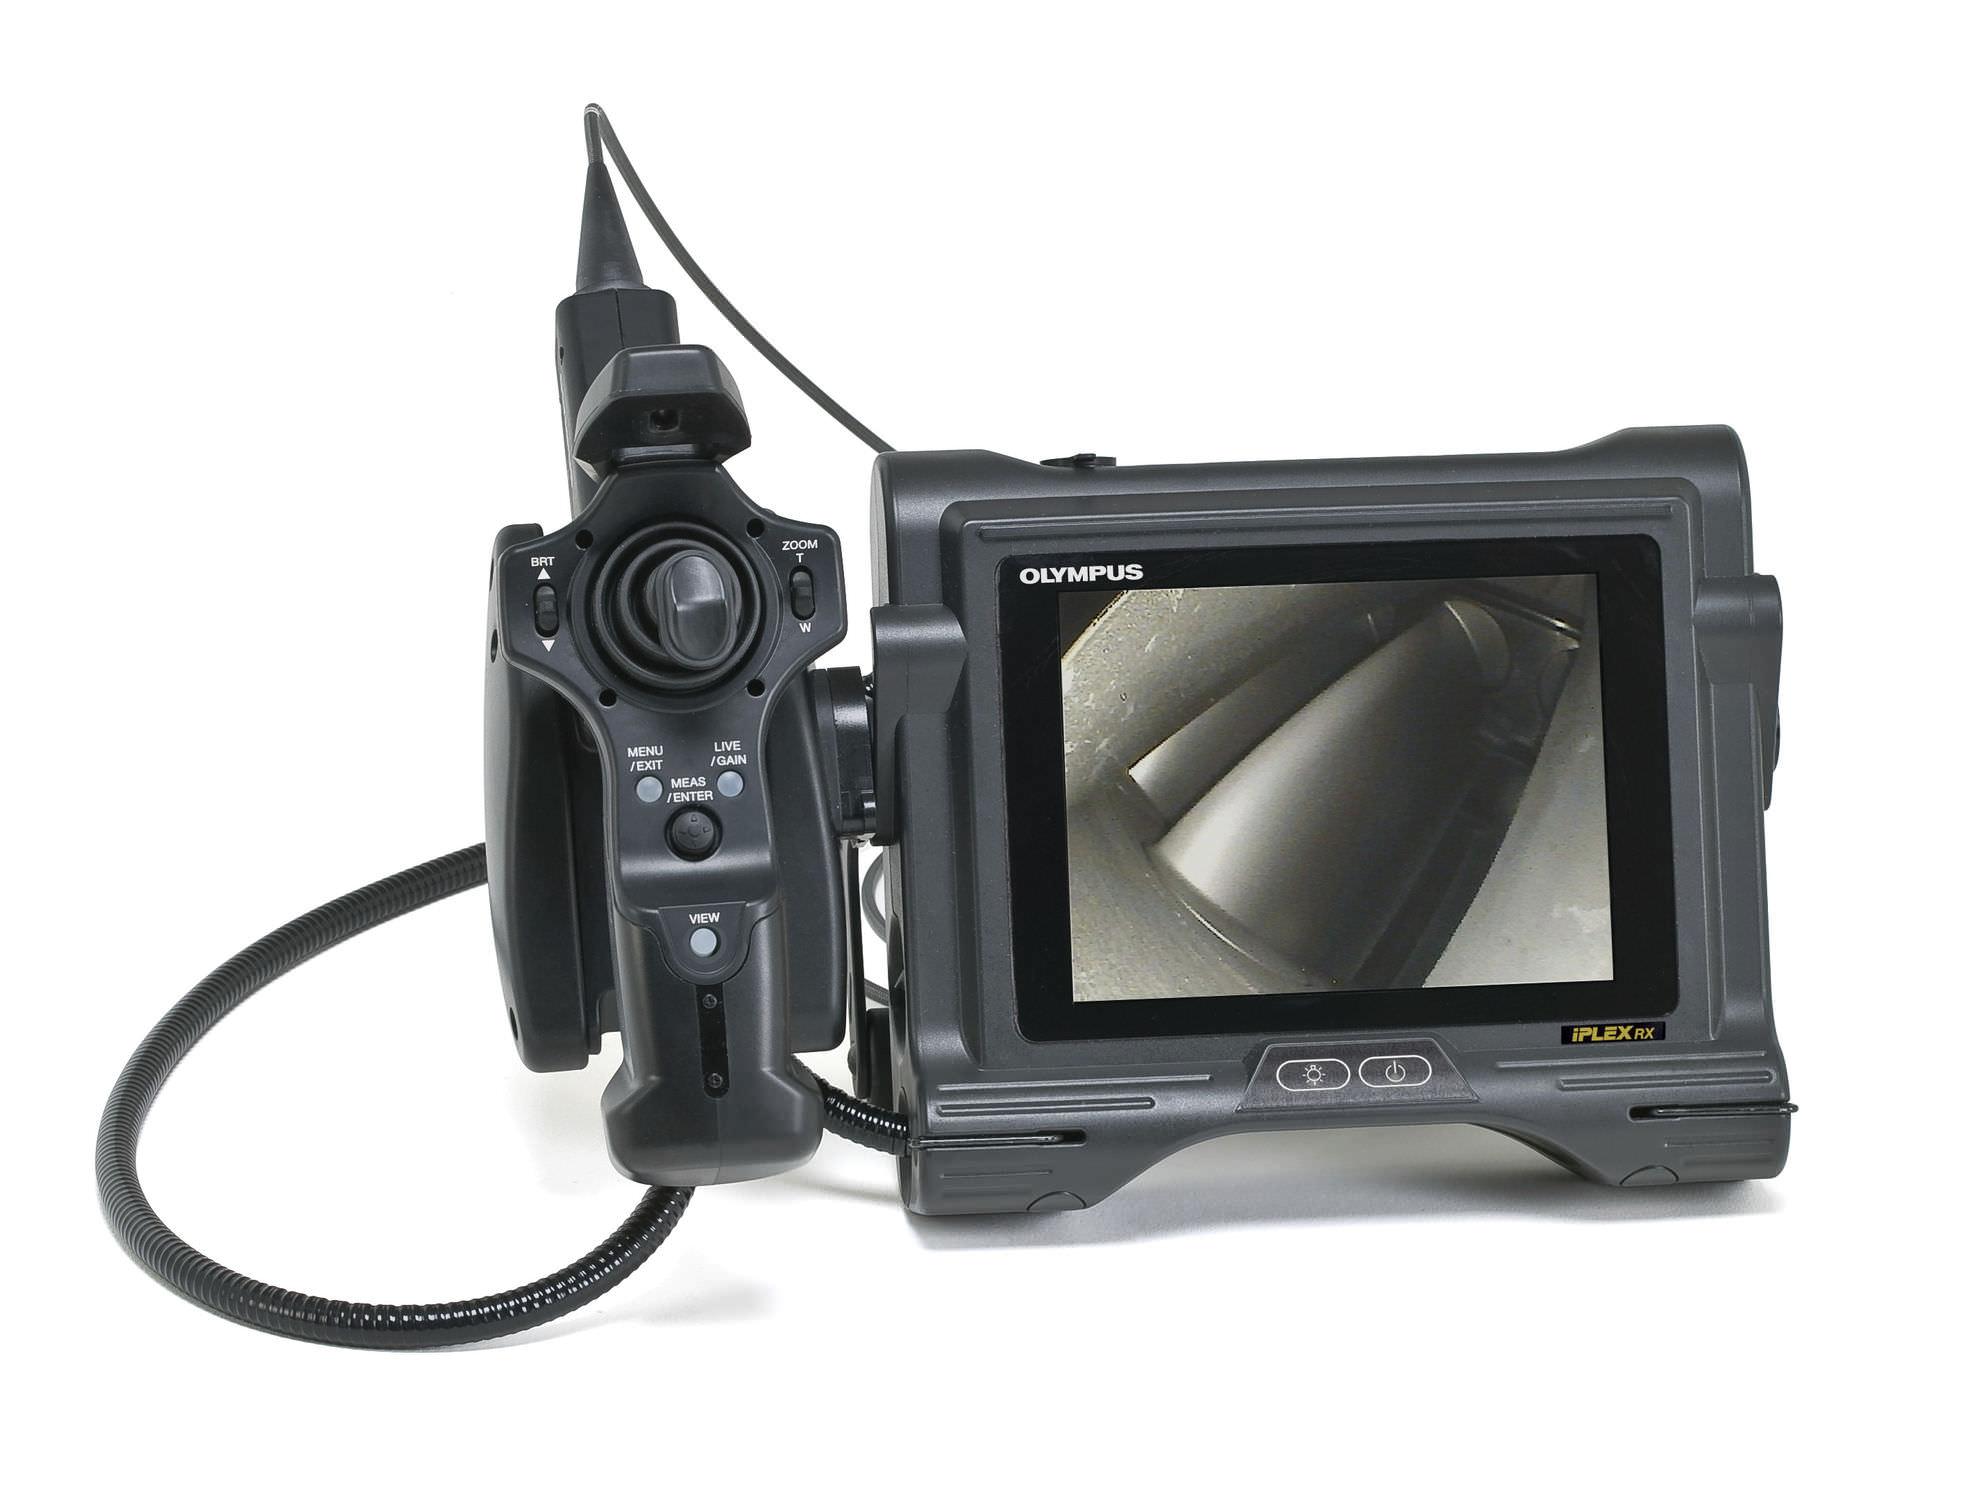 IPLEX RT - IV9420RT